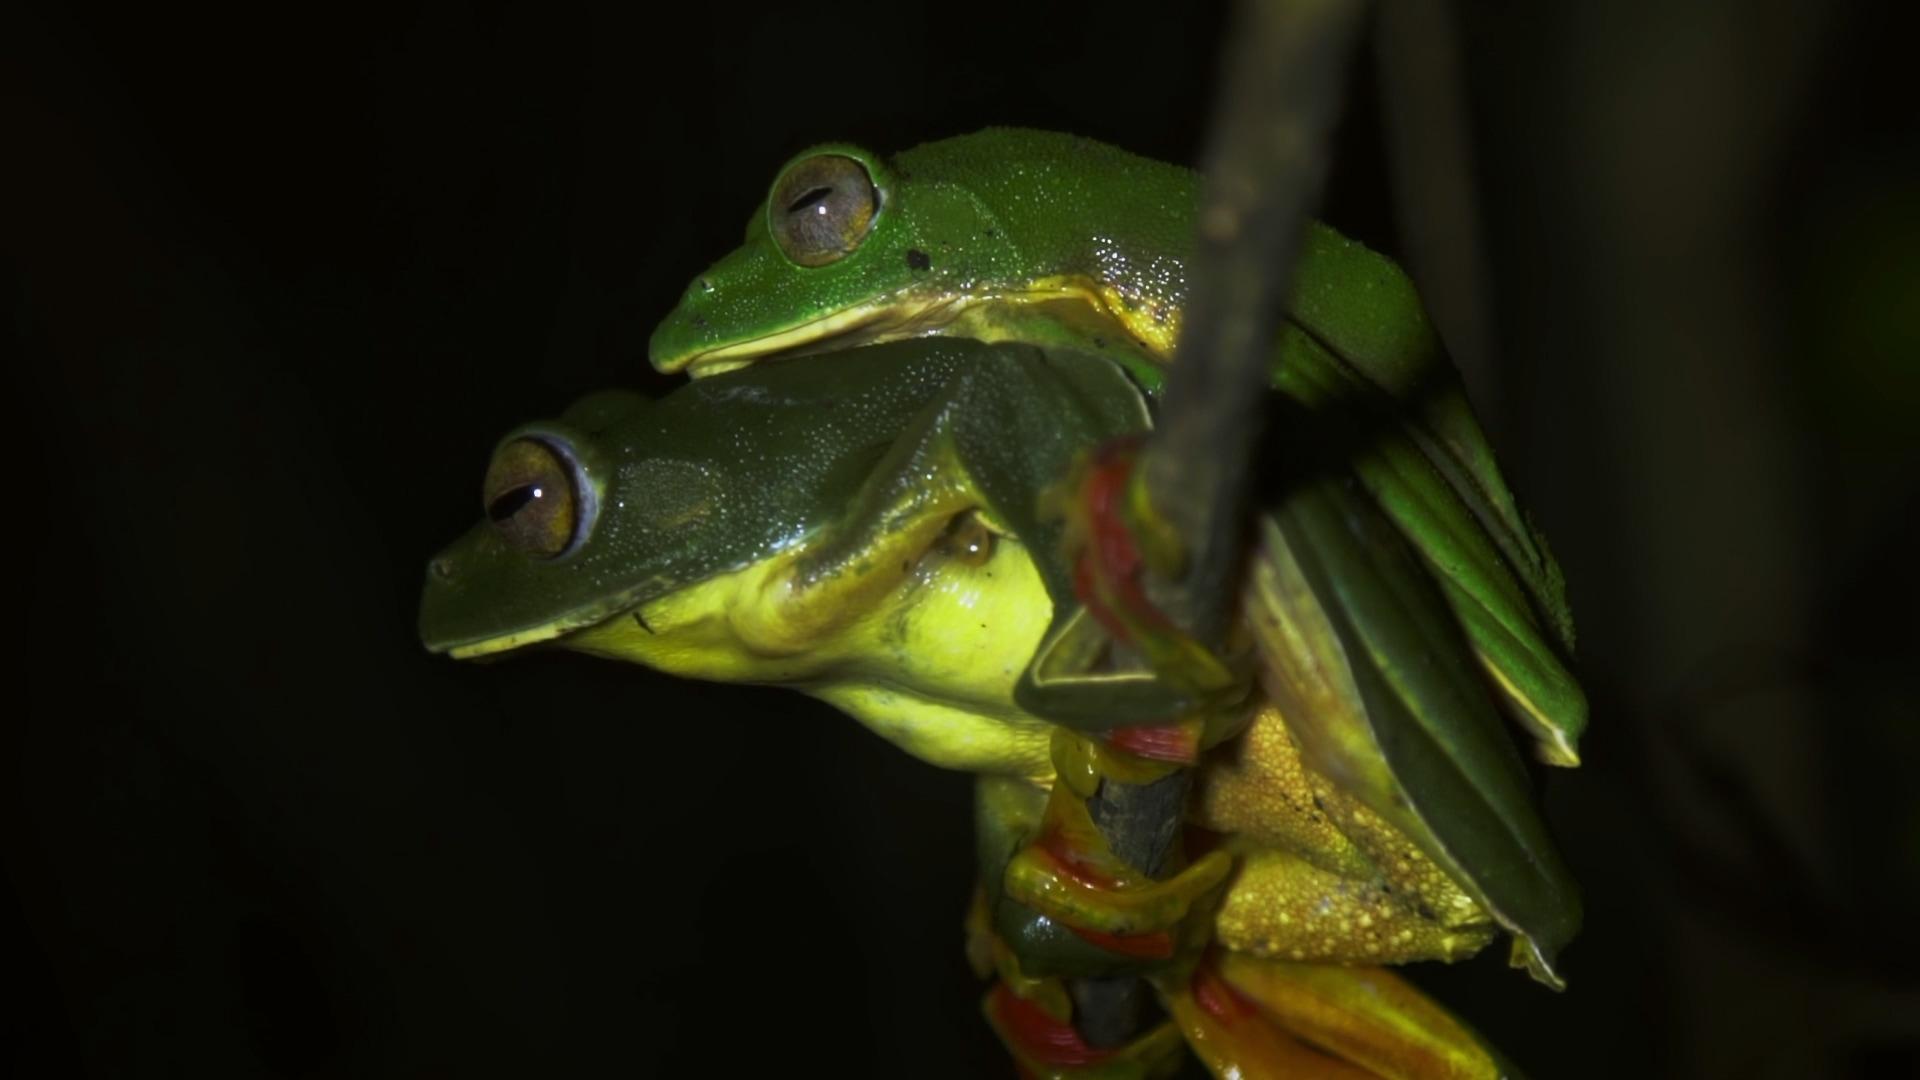 Malabar Gliding Frog: Nesting in a Cloud